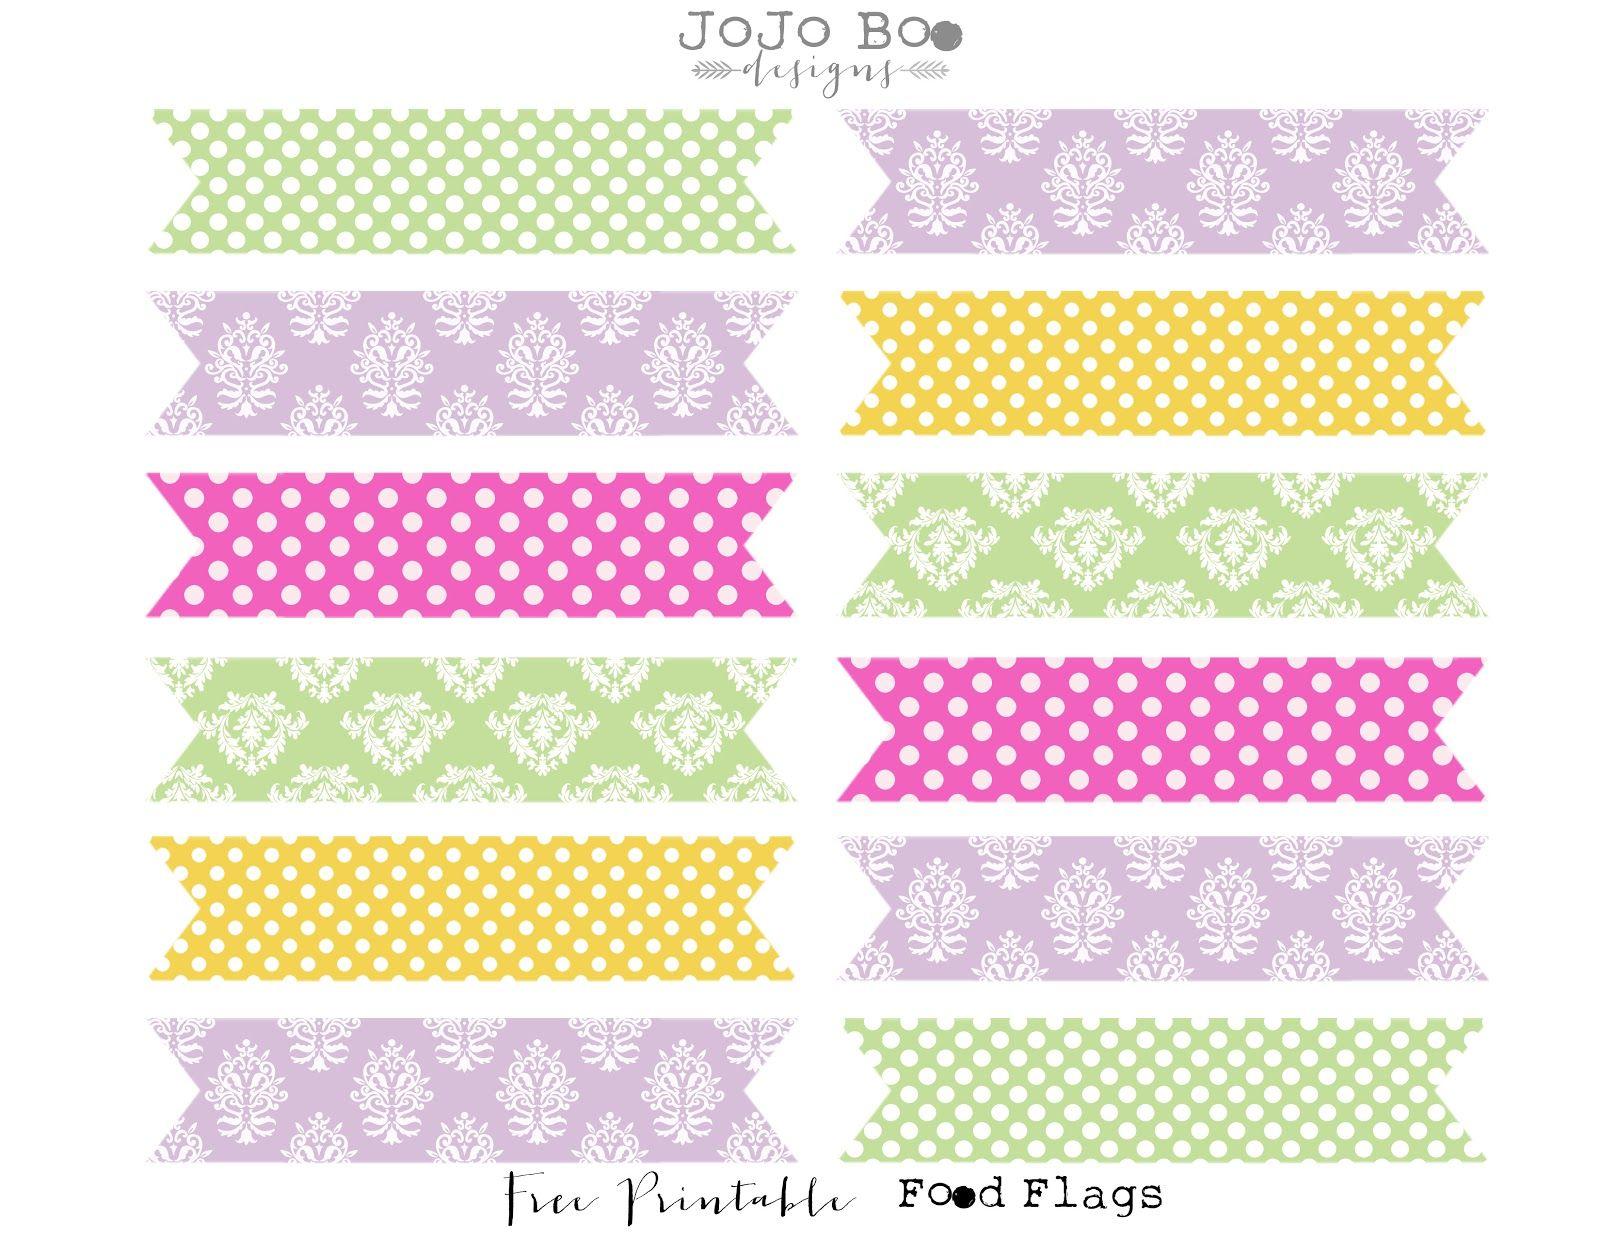 Jojo Boo Designs Sweet As A Cupcake Free Printables